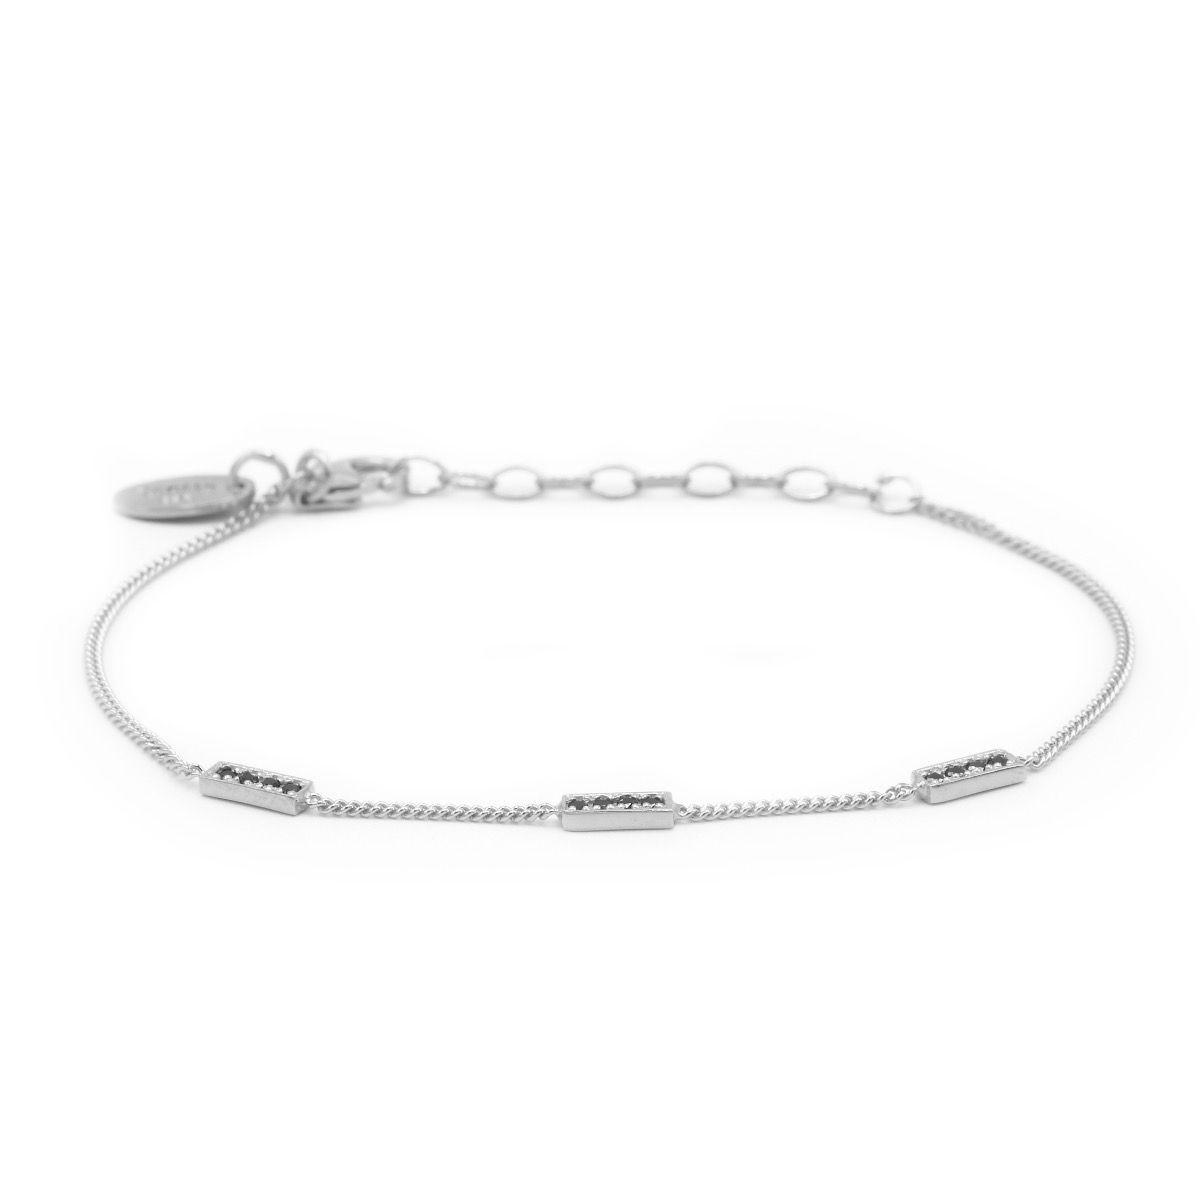 karma-armband-3-black-zirconia-rectangles-925-sterling-zilver